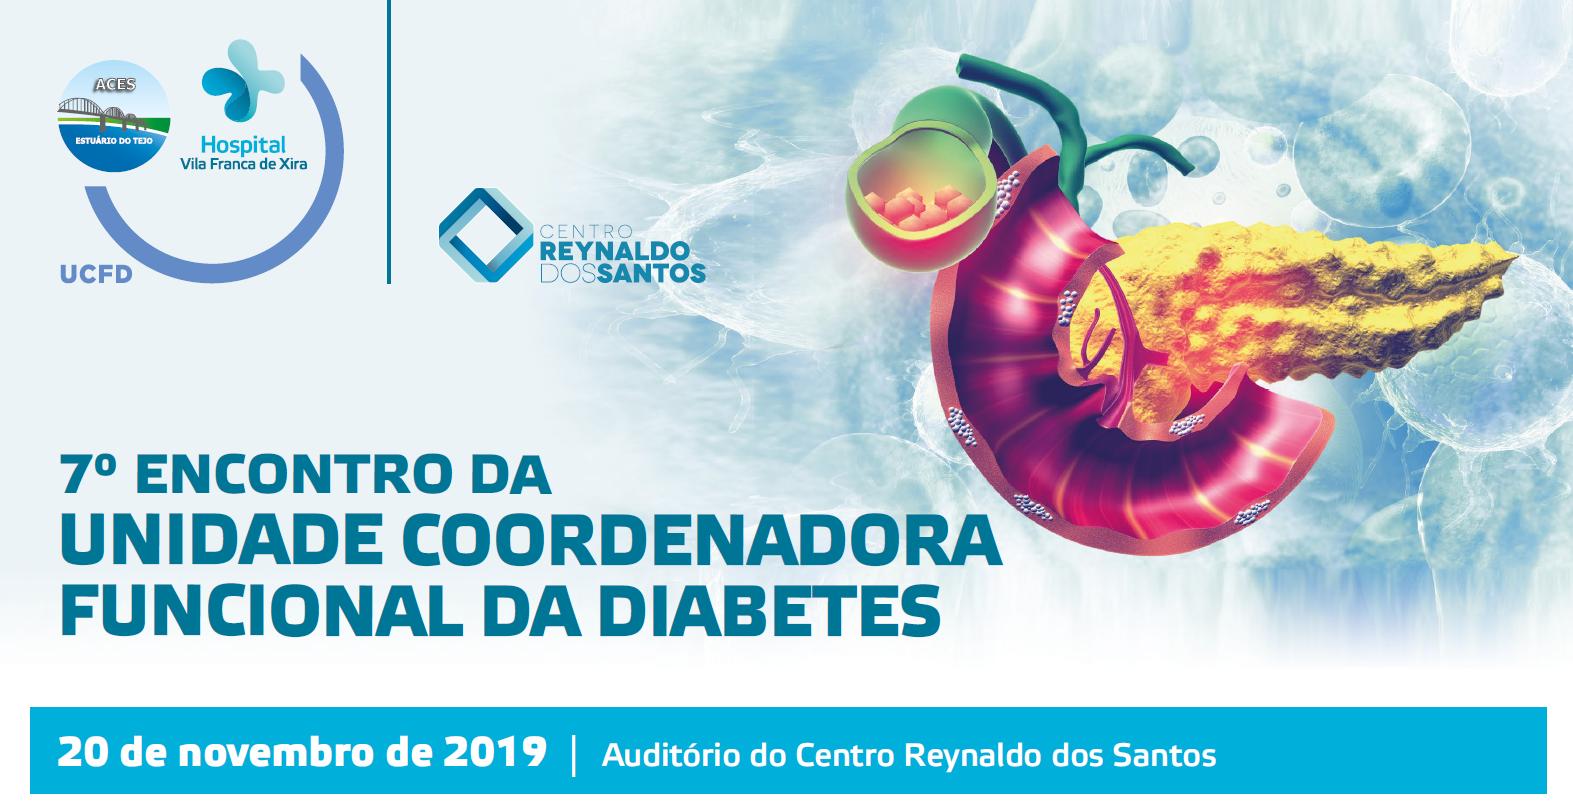 hospital-de-vila-franca-de-xira-7º Encontro da Unidade Coordenadora Funcional da Diabetes